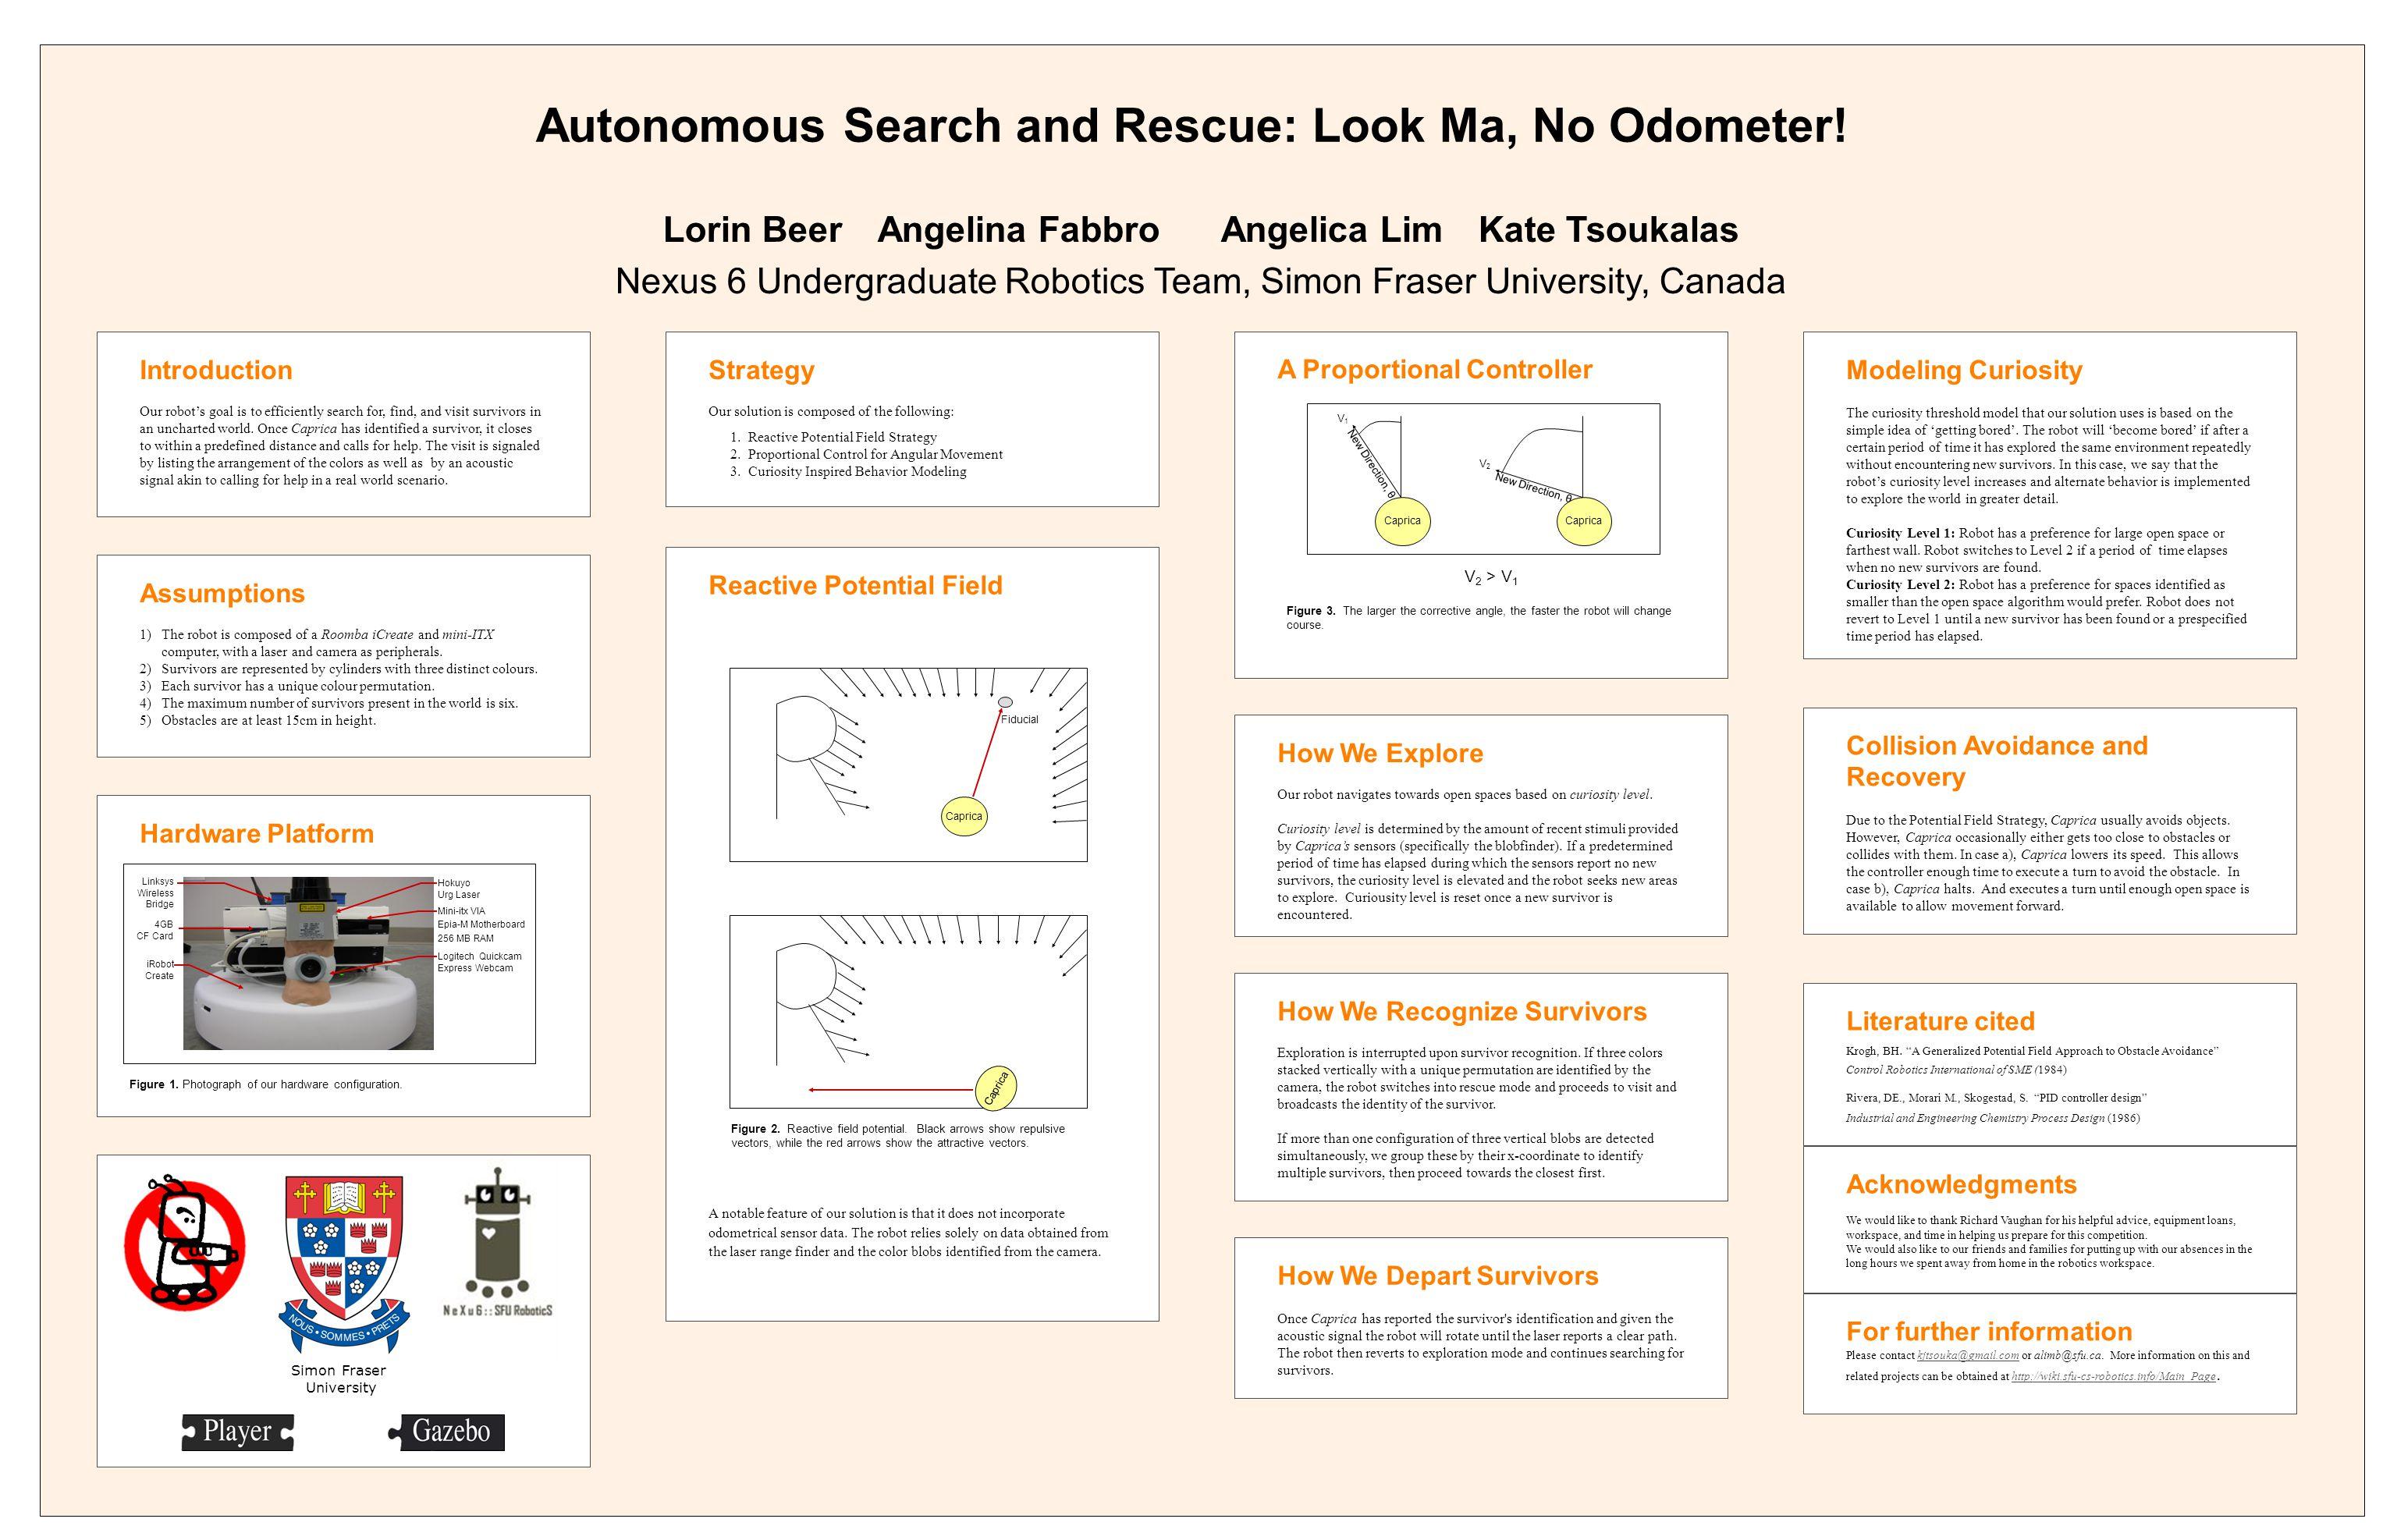 Lorin BeerAngelina FabbroAngelica LimKate Tsoukalas Nexus 6 Undergraduate Robotics Team, Simon Fraser University, Canada Autonomous Search and Rescue: Look Ma, No Odometer.